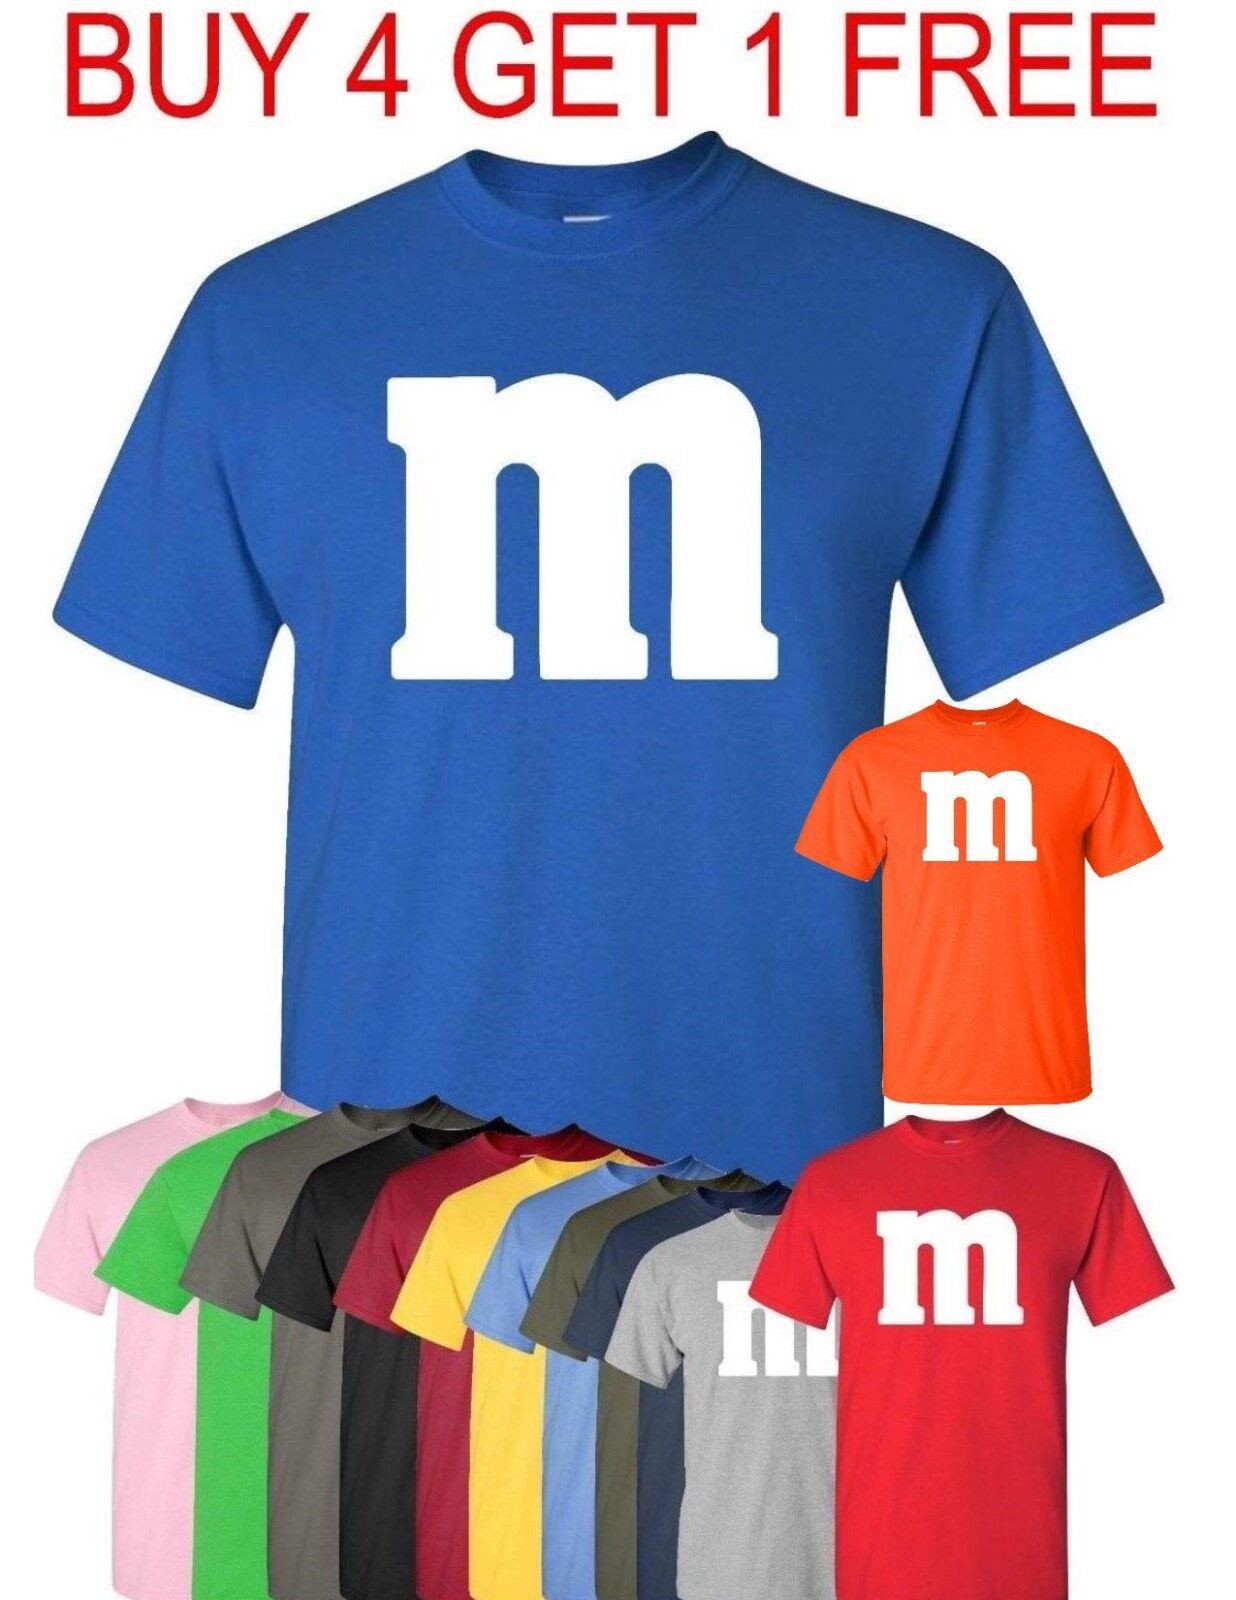 M & M T-Shirt Halloween T shirt Costume M and M  Costumes Tee